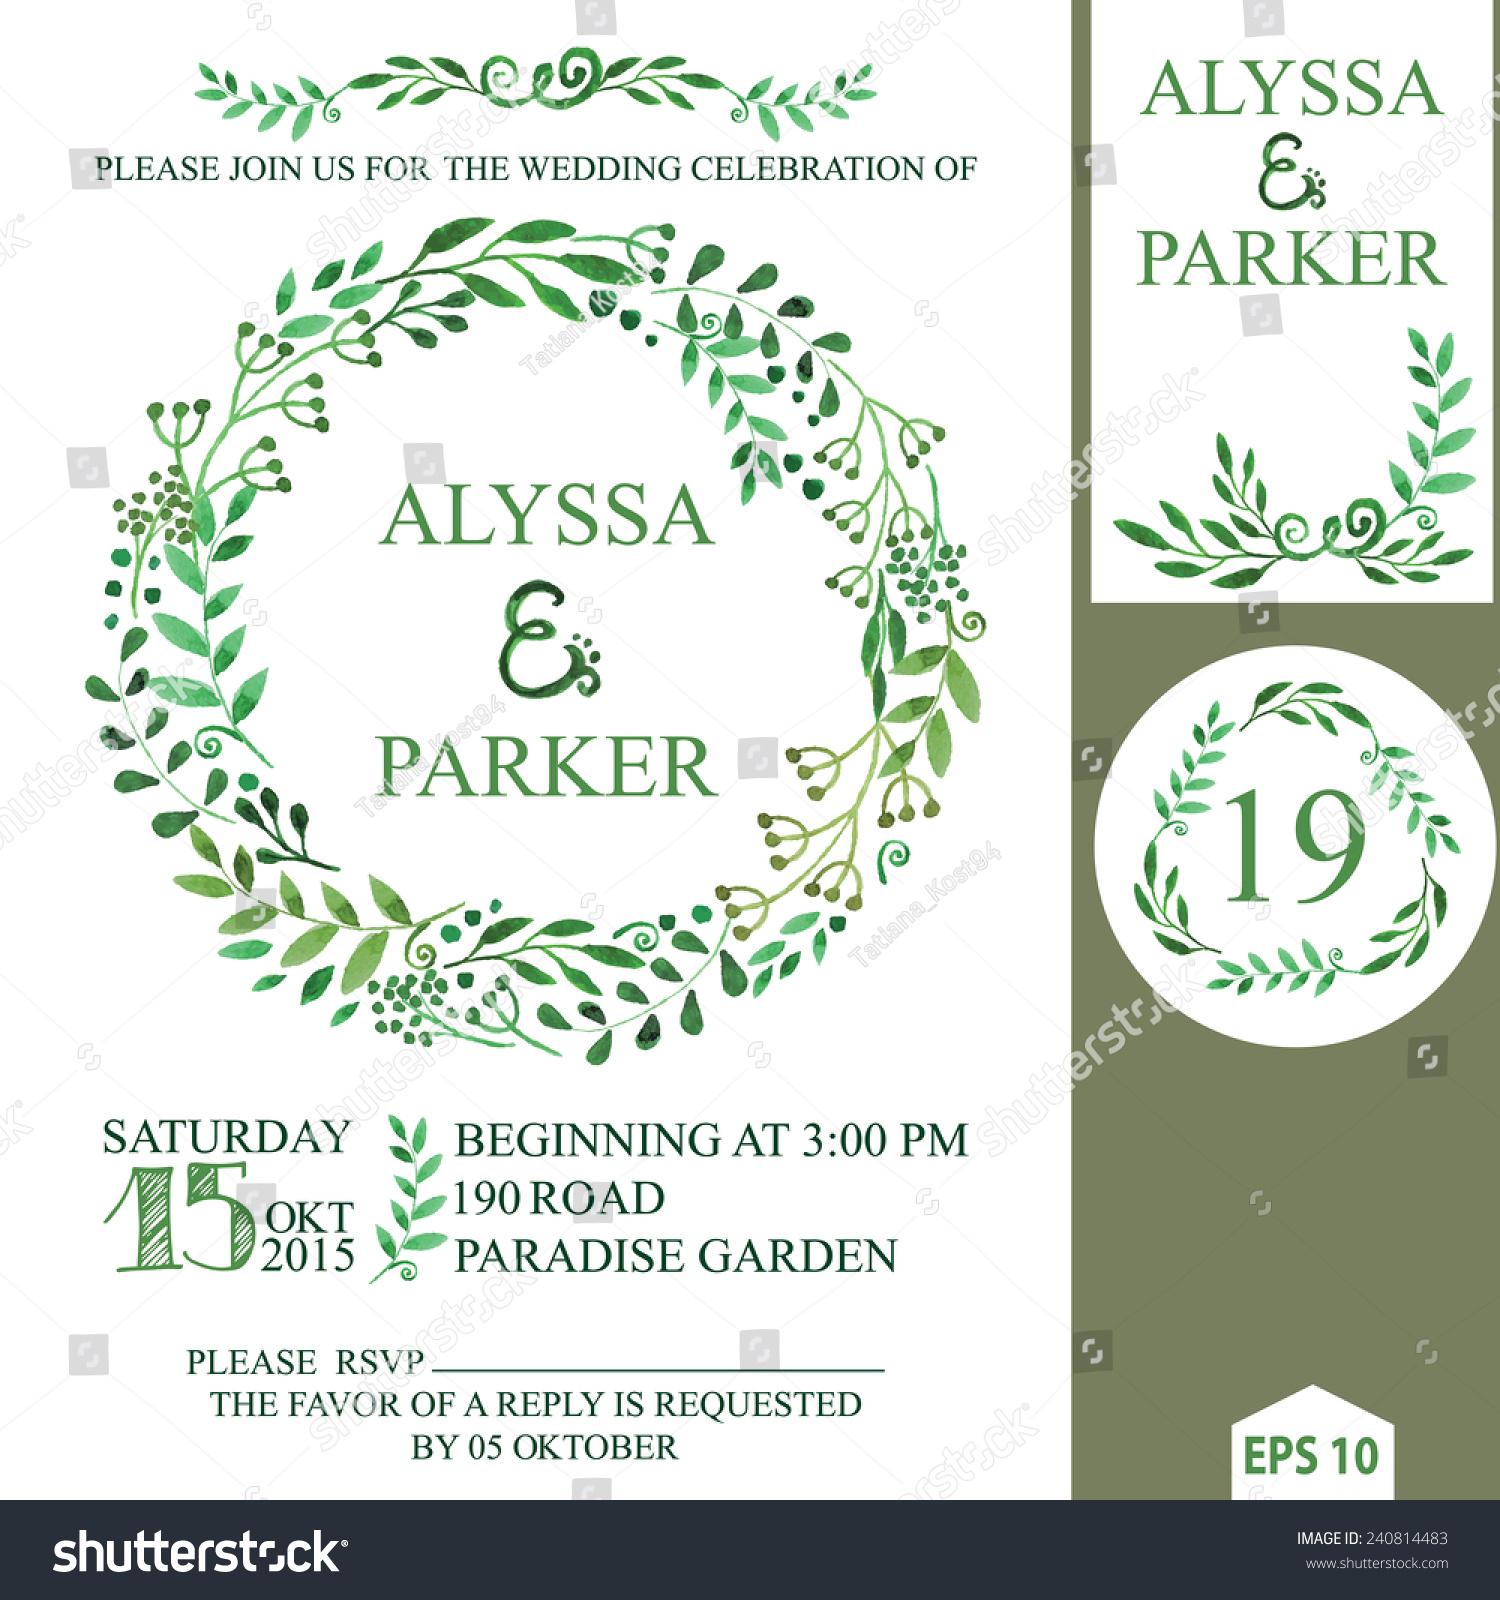 wedding invites wedding invitations design 20 best images about wedding invites on Pinterest Typography wedding invitations Fonts and Letterpress wedding invitations